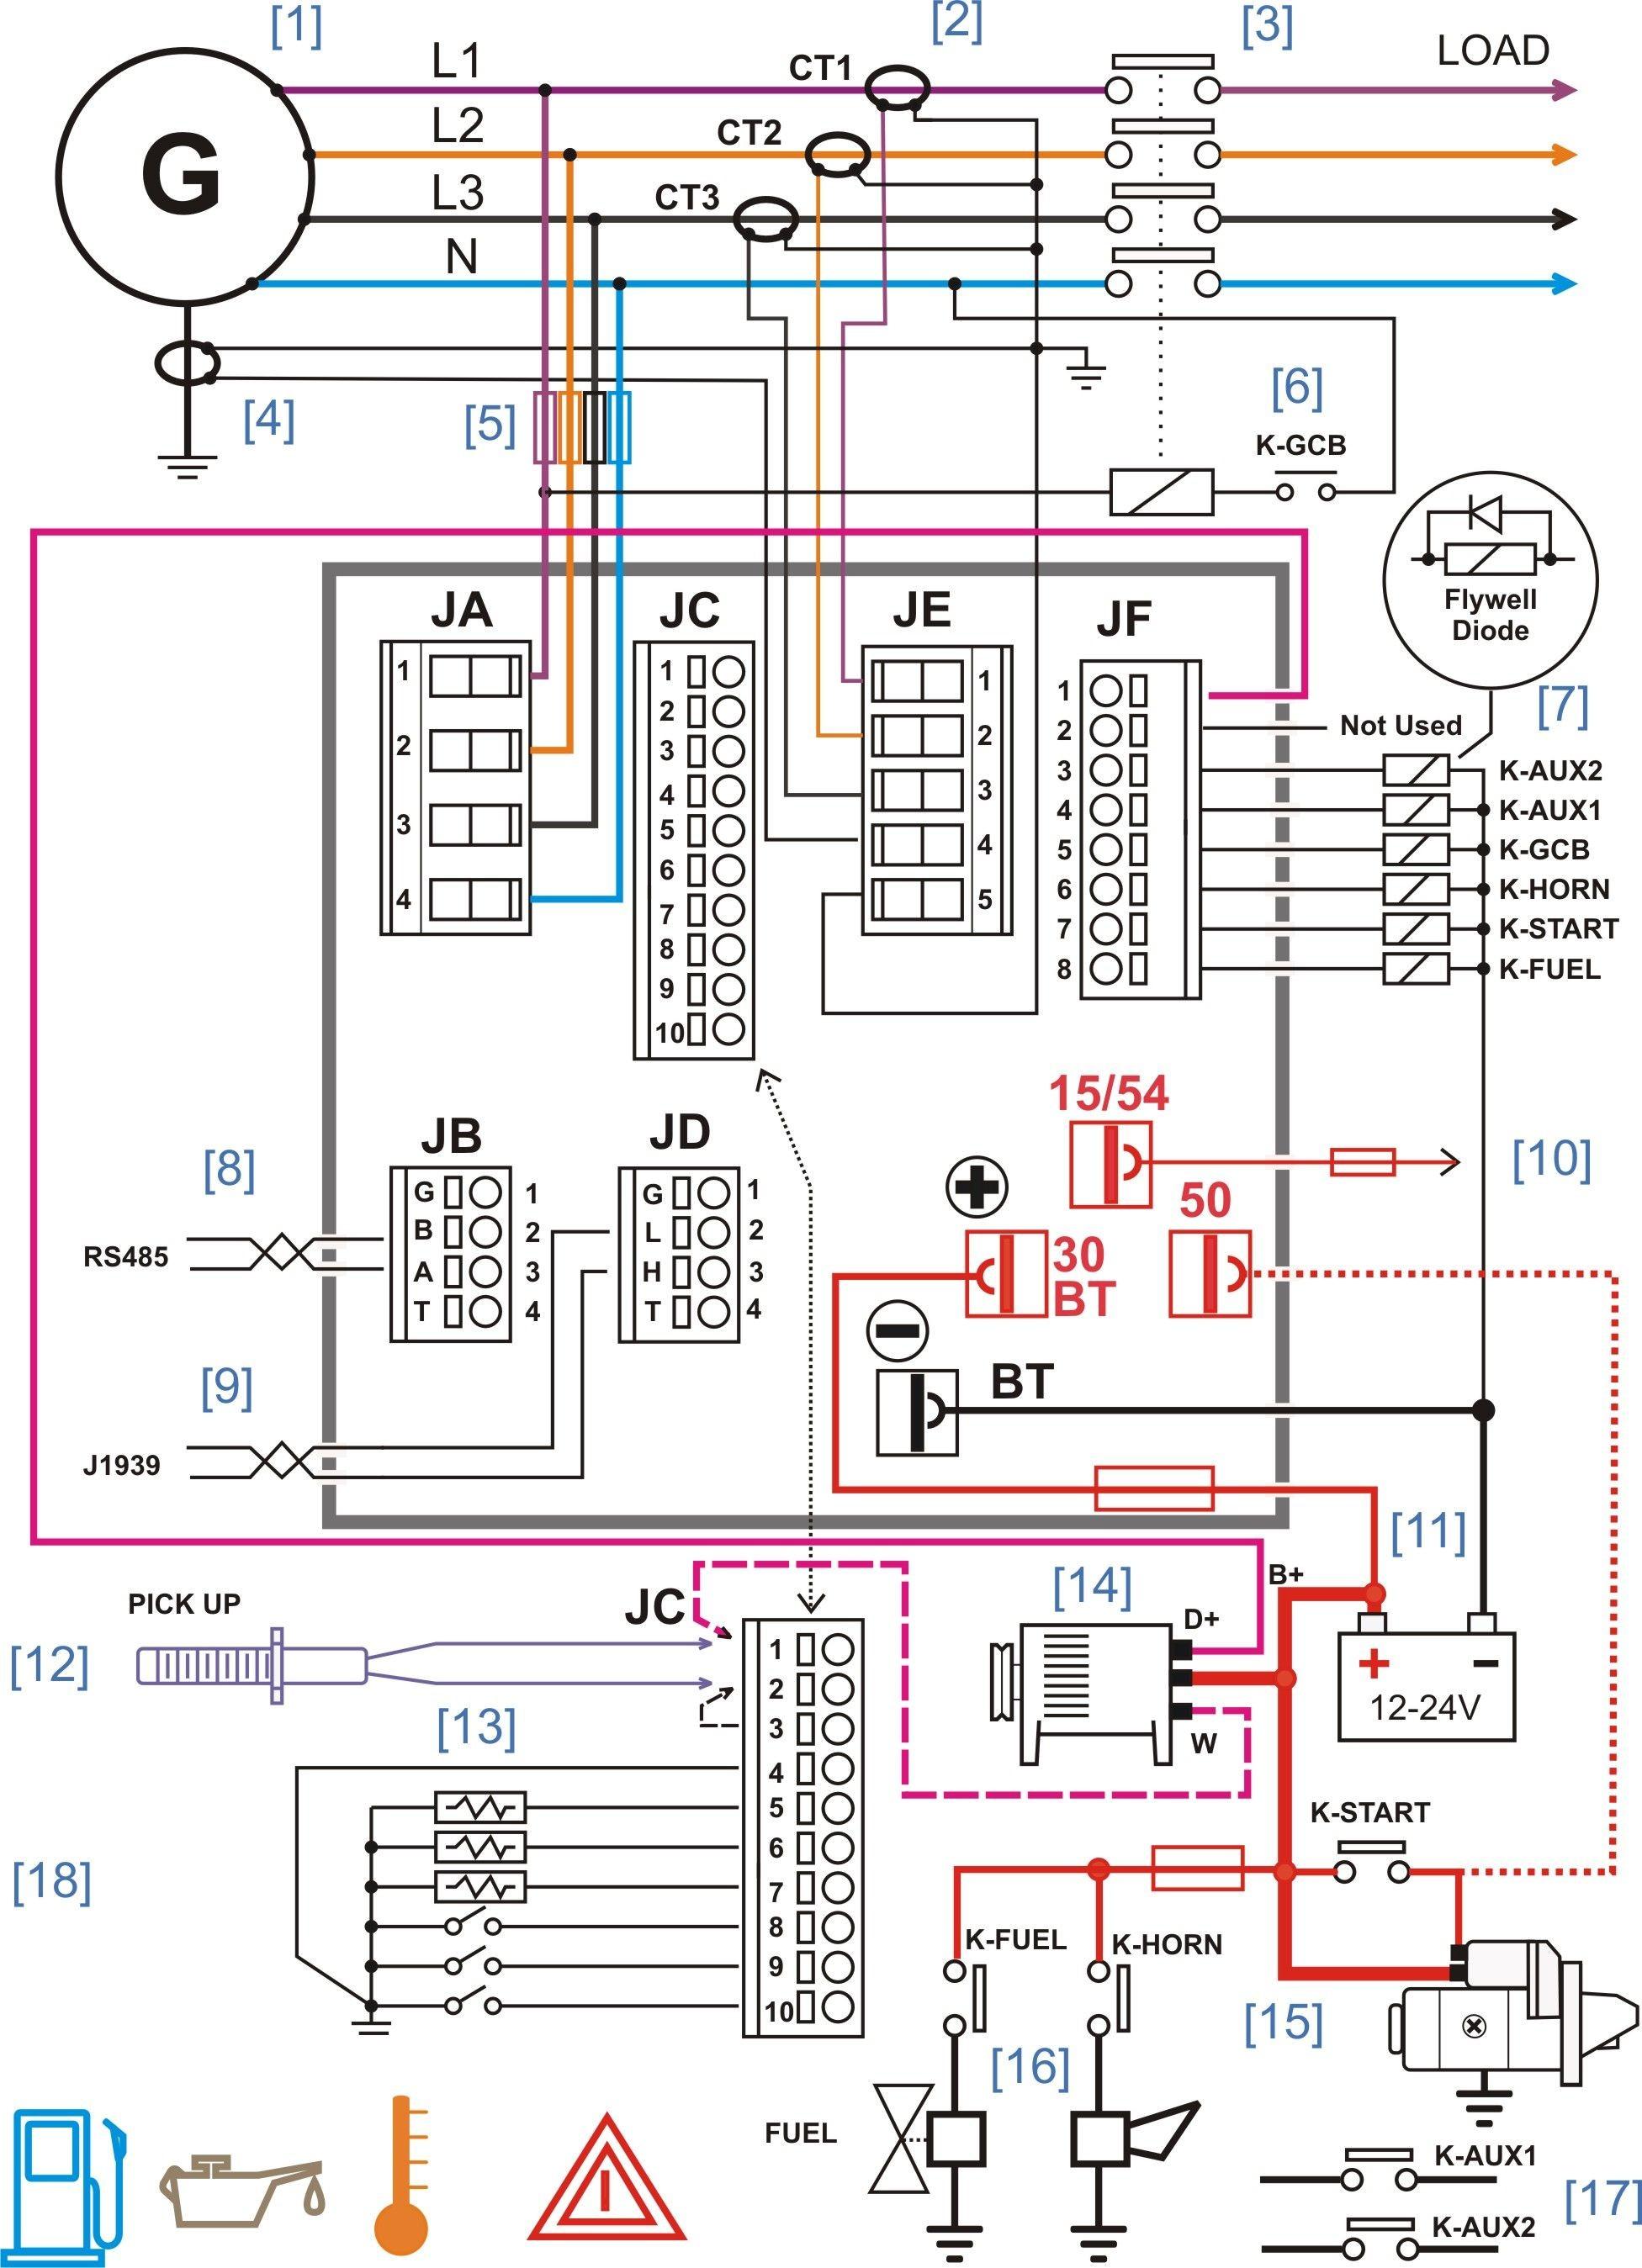 hight resolution of  bike wiring diagram ponent bmw motorcycle k75 wiring diagram k1100 on triumph sprint st wiring diagram